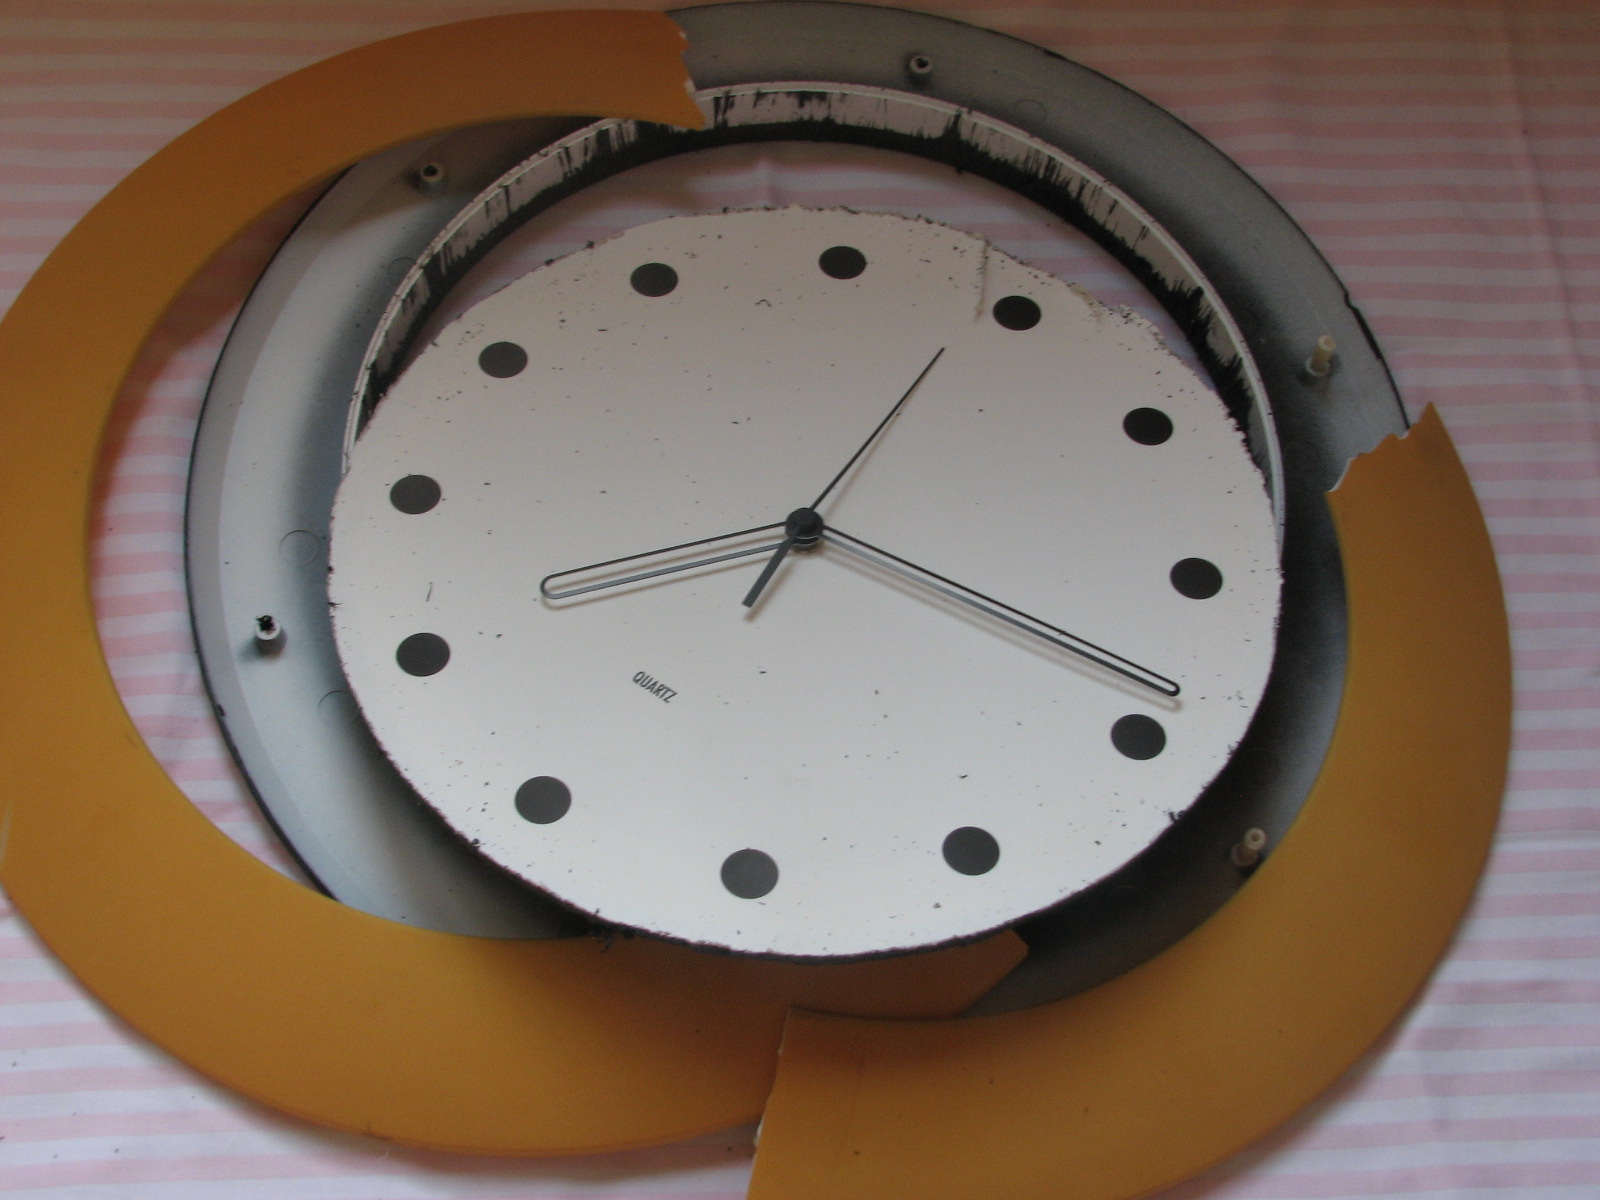 bazooka crafts death star clock. Black Bedroom Furniture Sets. Home Design Ideas